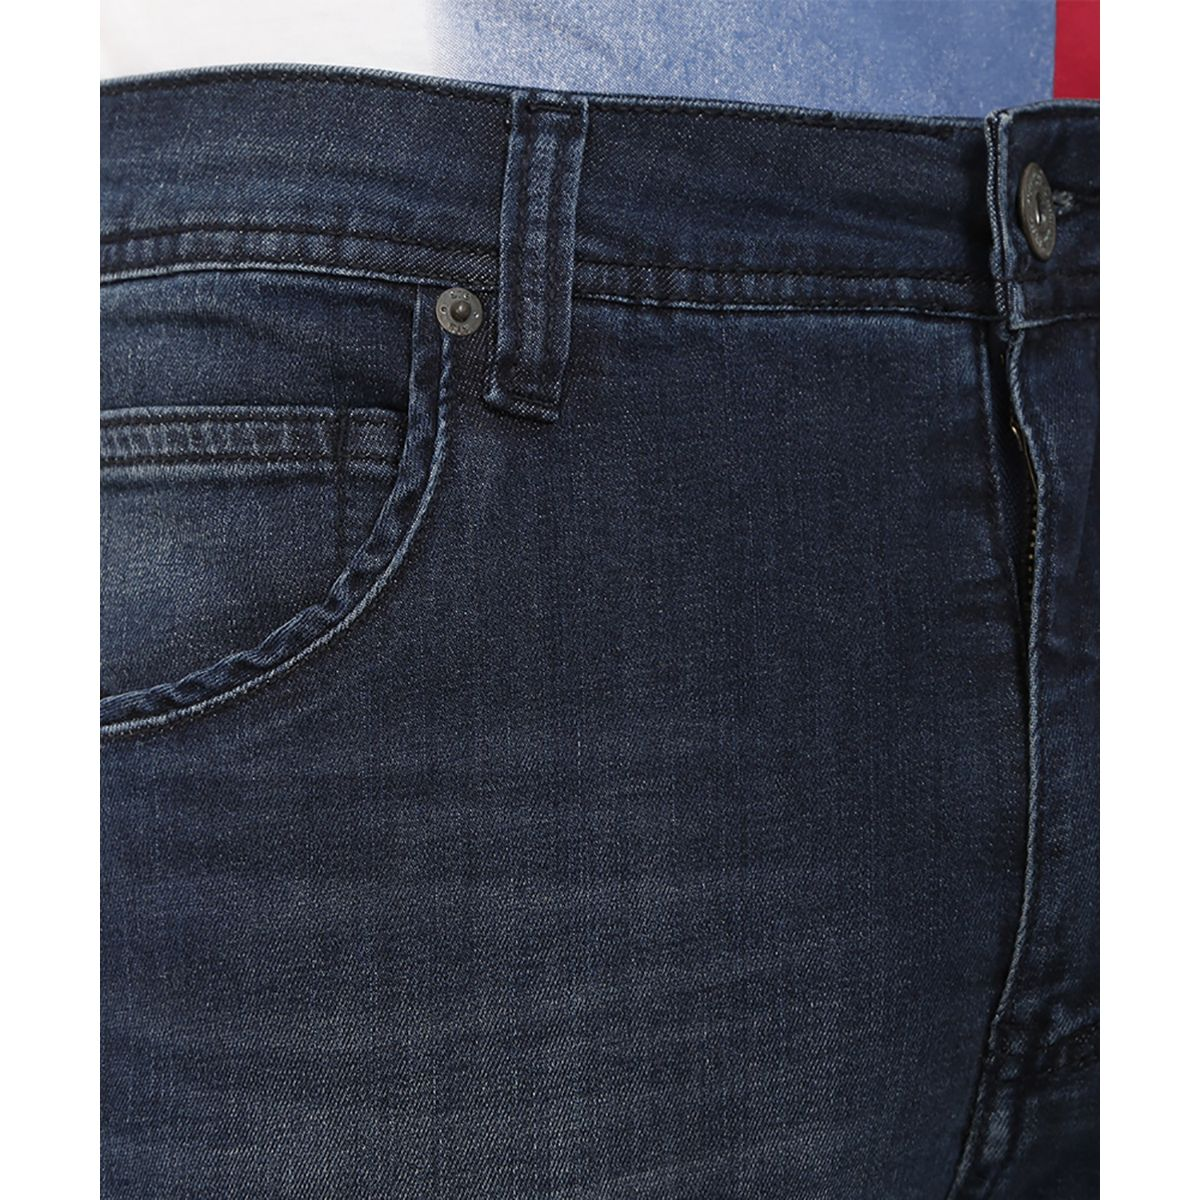 Calca-5-Pockets-Azul---42